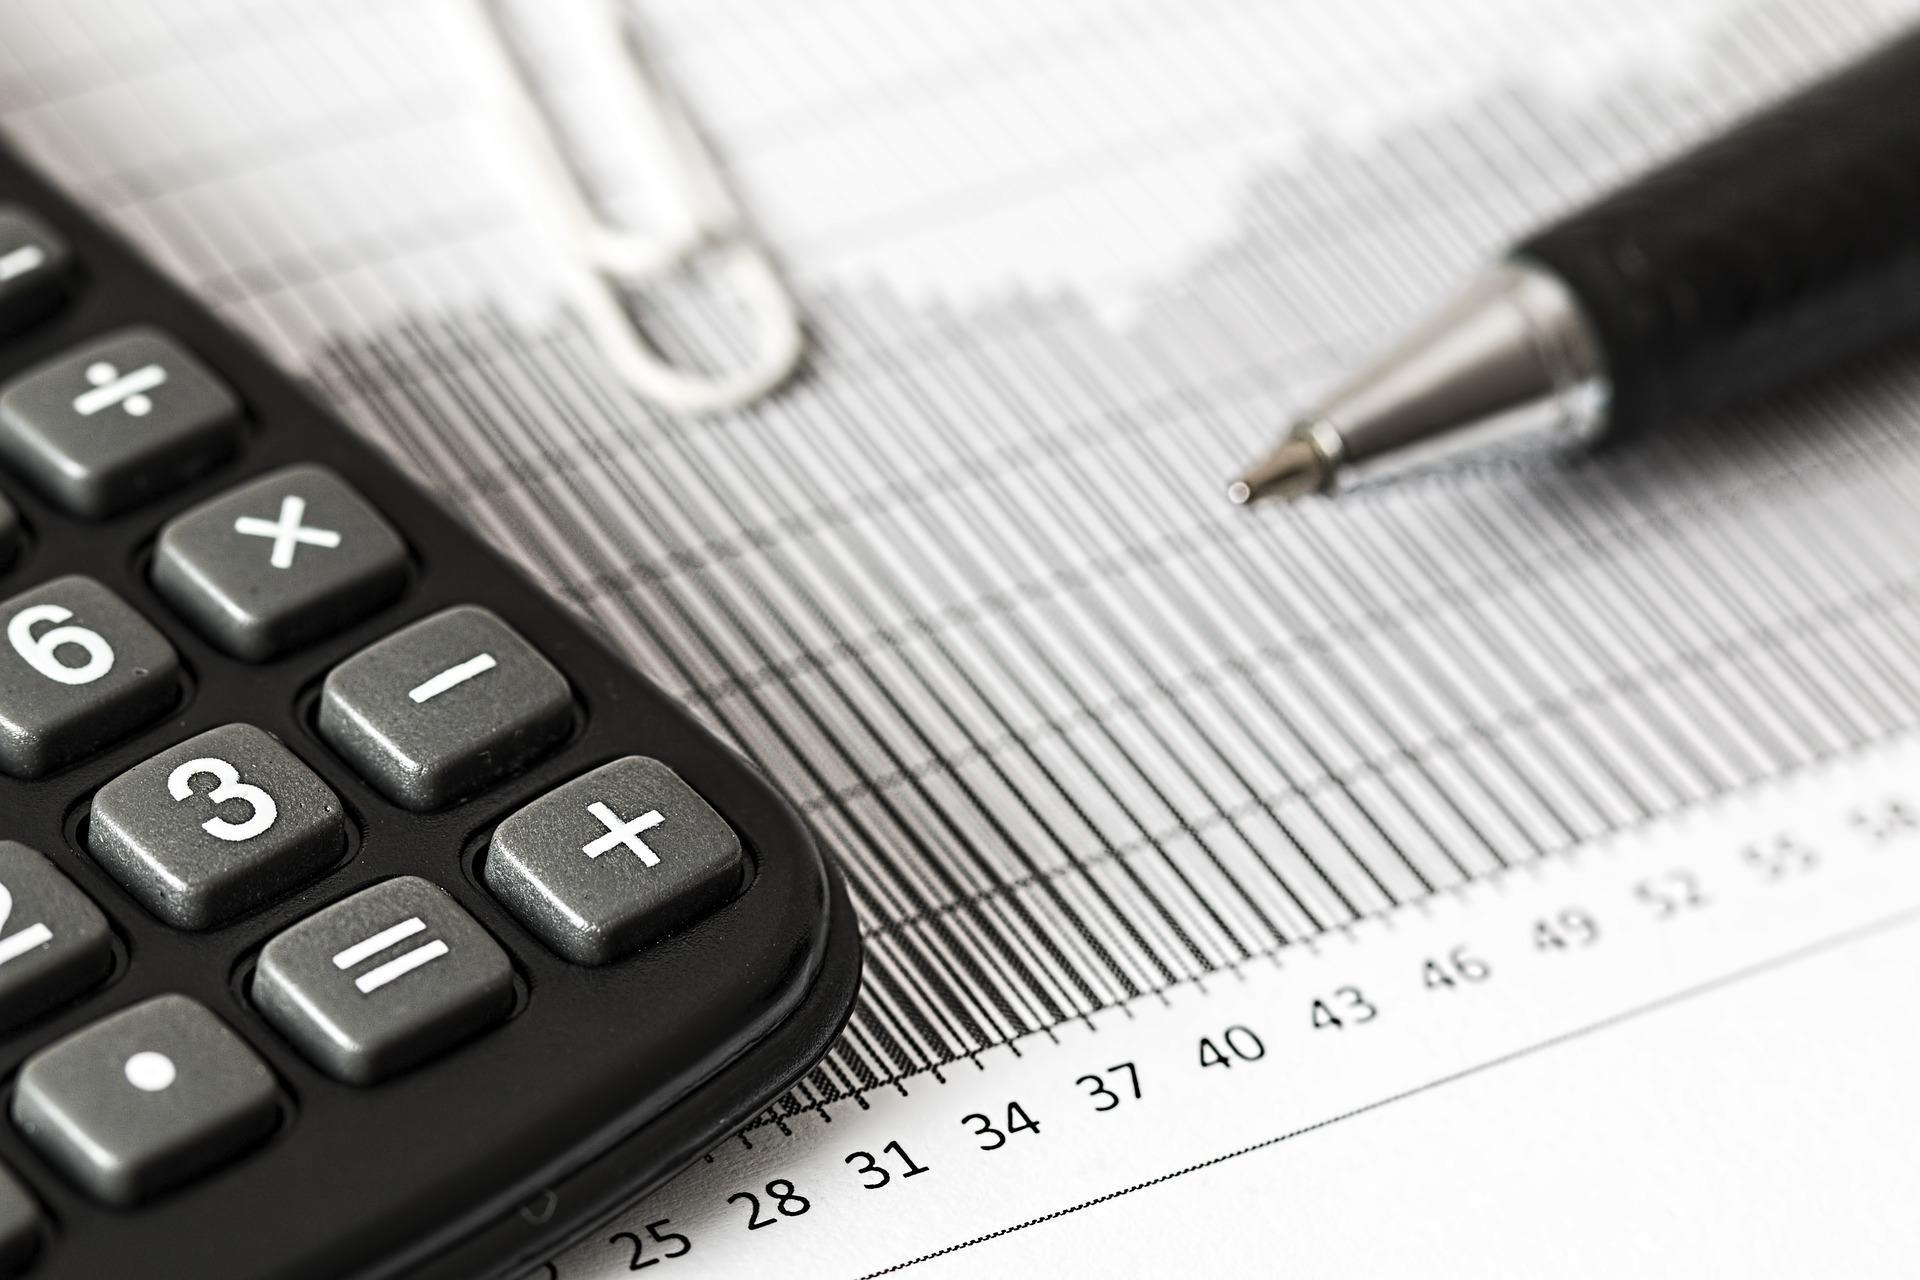 Aktien-Leerverkäufe und die Kapitalertragsteuer